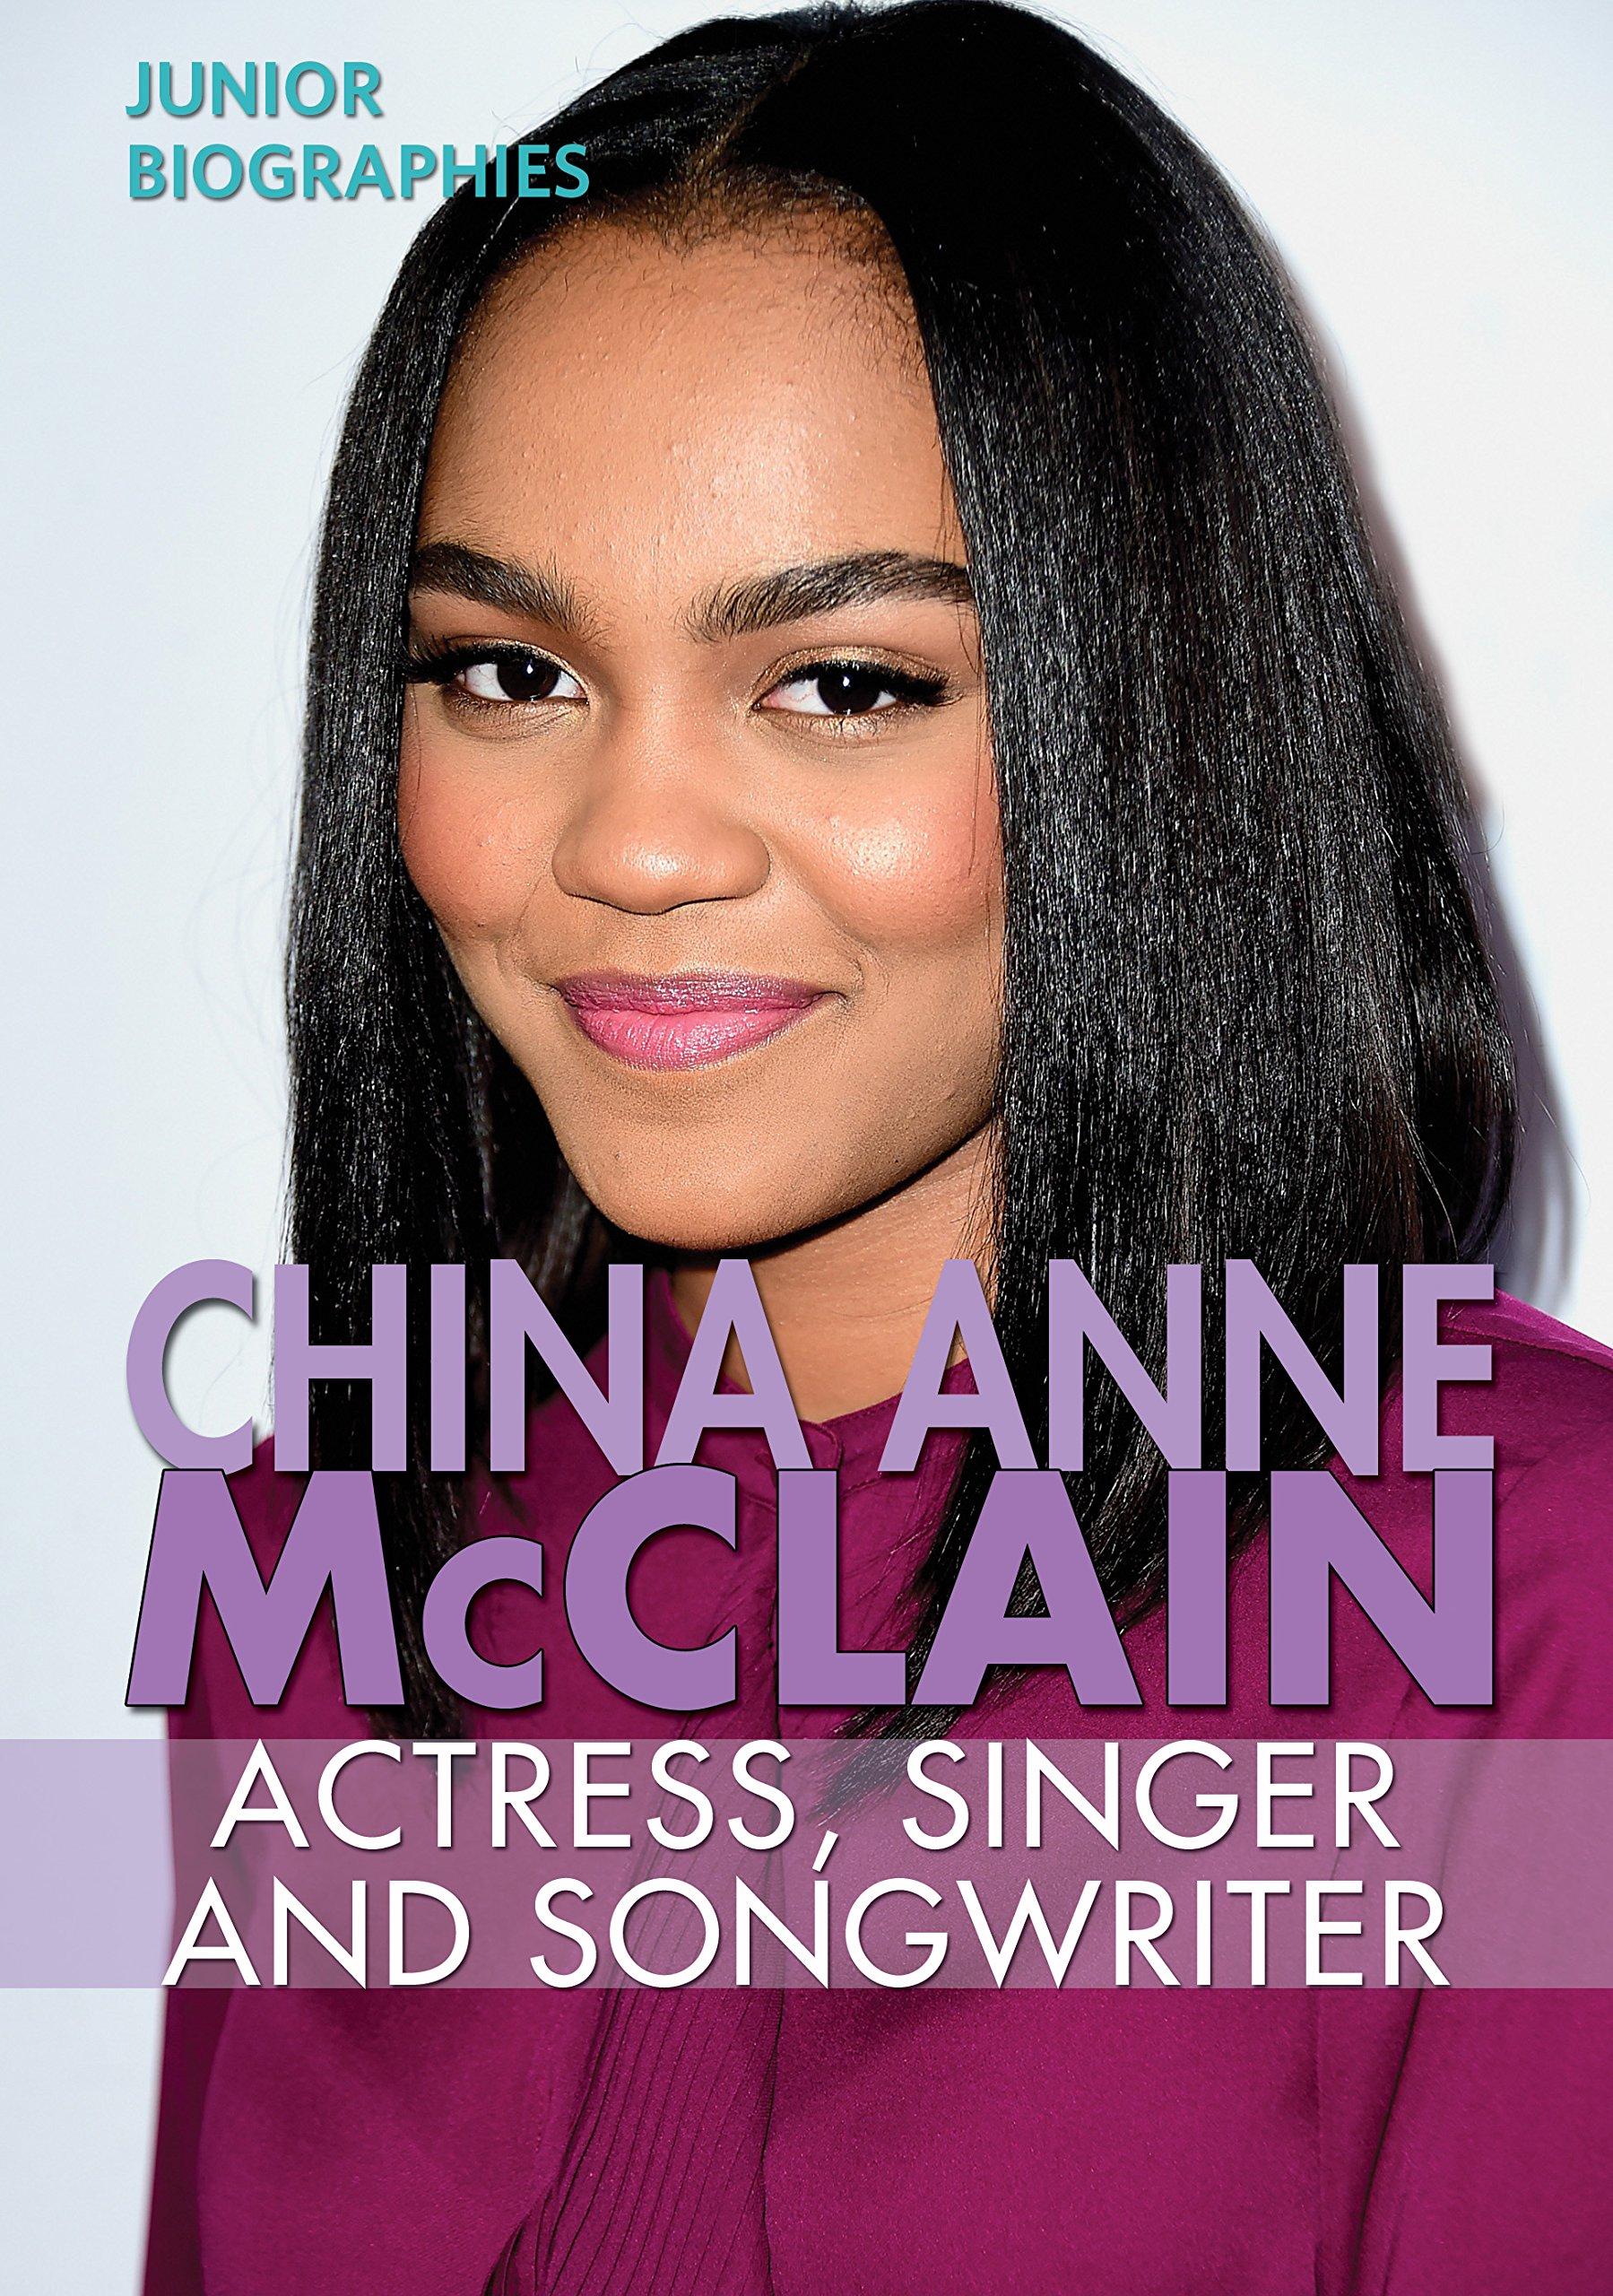 China Anne Mcclain Actress Singer And Songwriter Junior Biographies Rajczak Nelson Kristen 9780766081840 Amazon Com Books